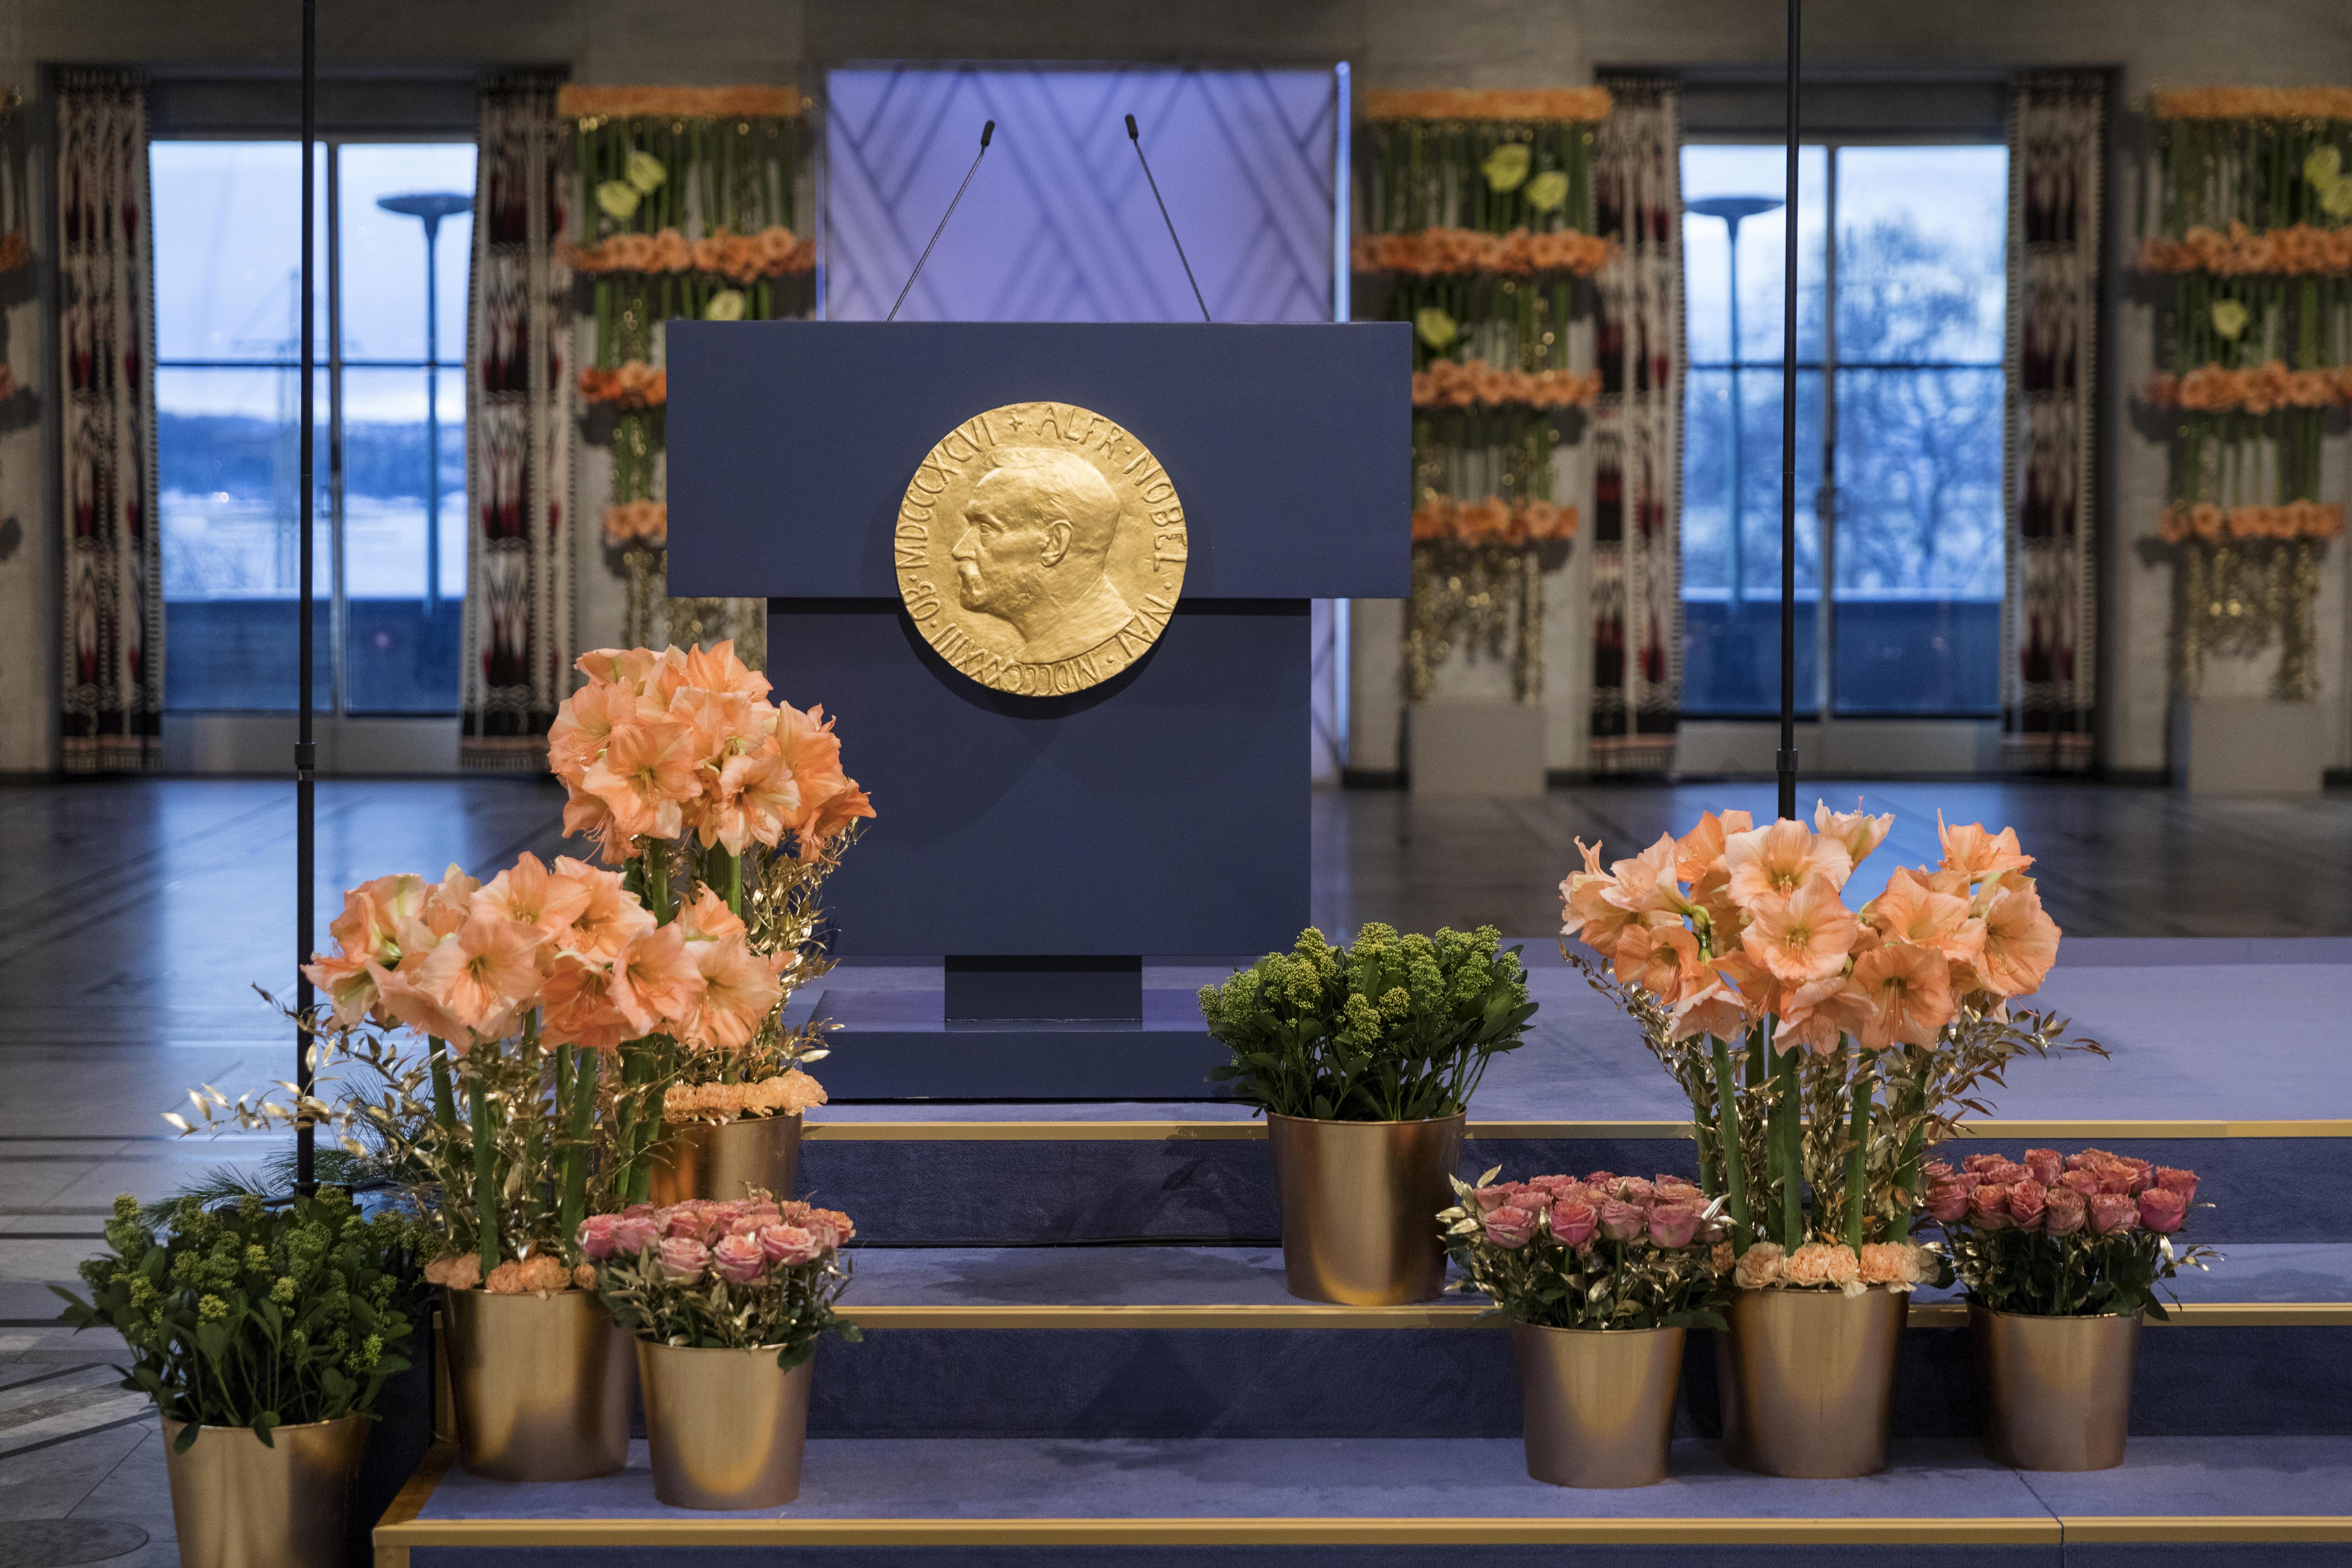 The Nobel Peace Prize ceremony